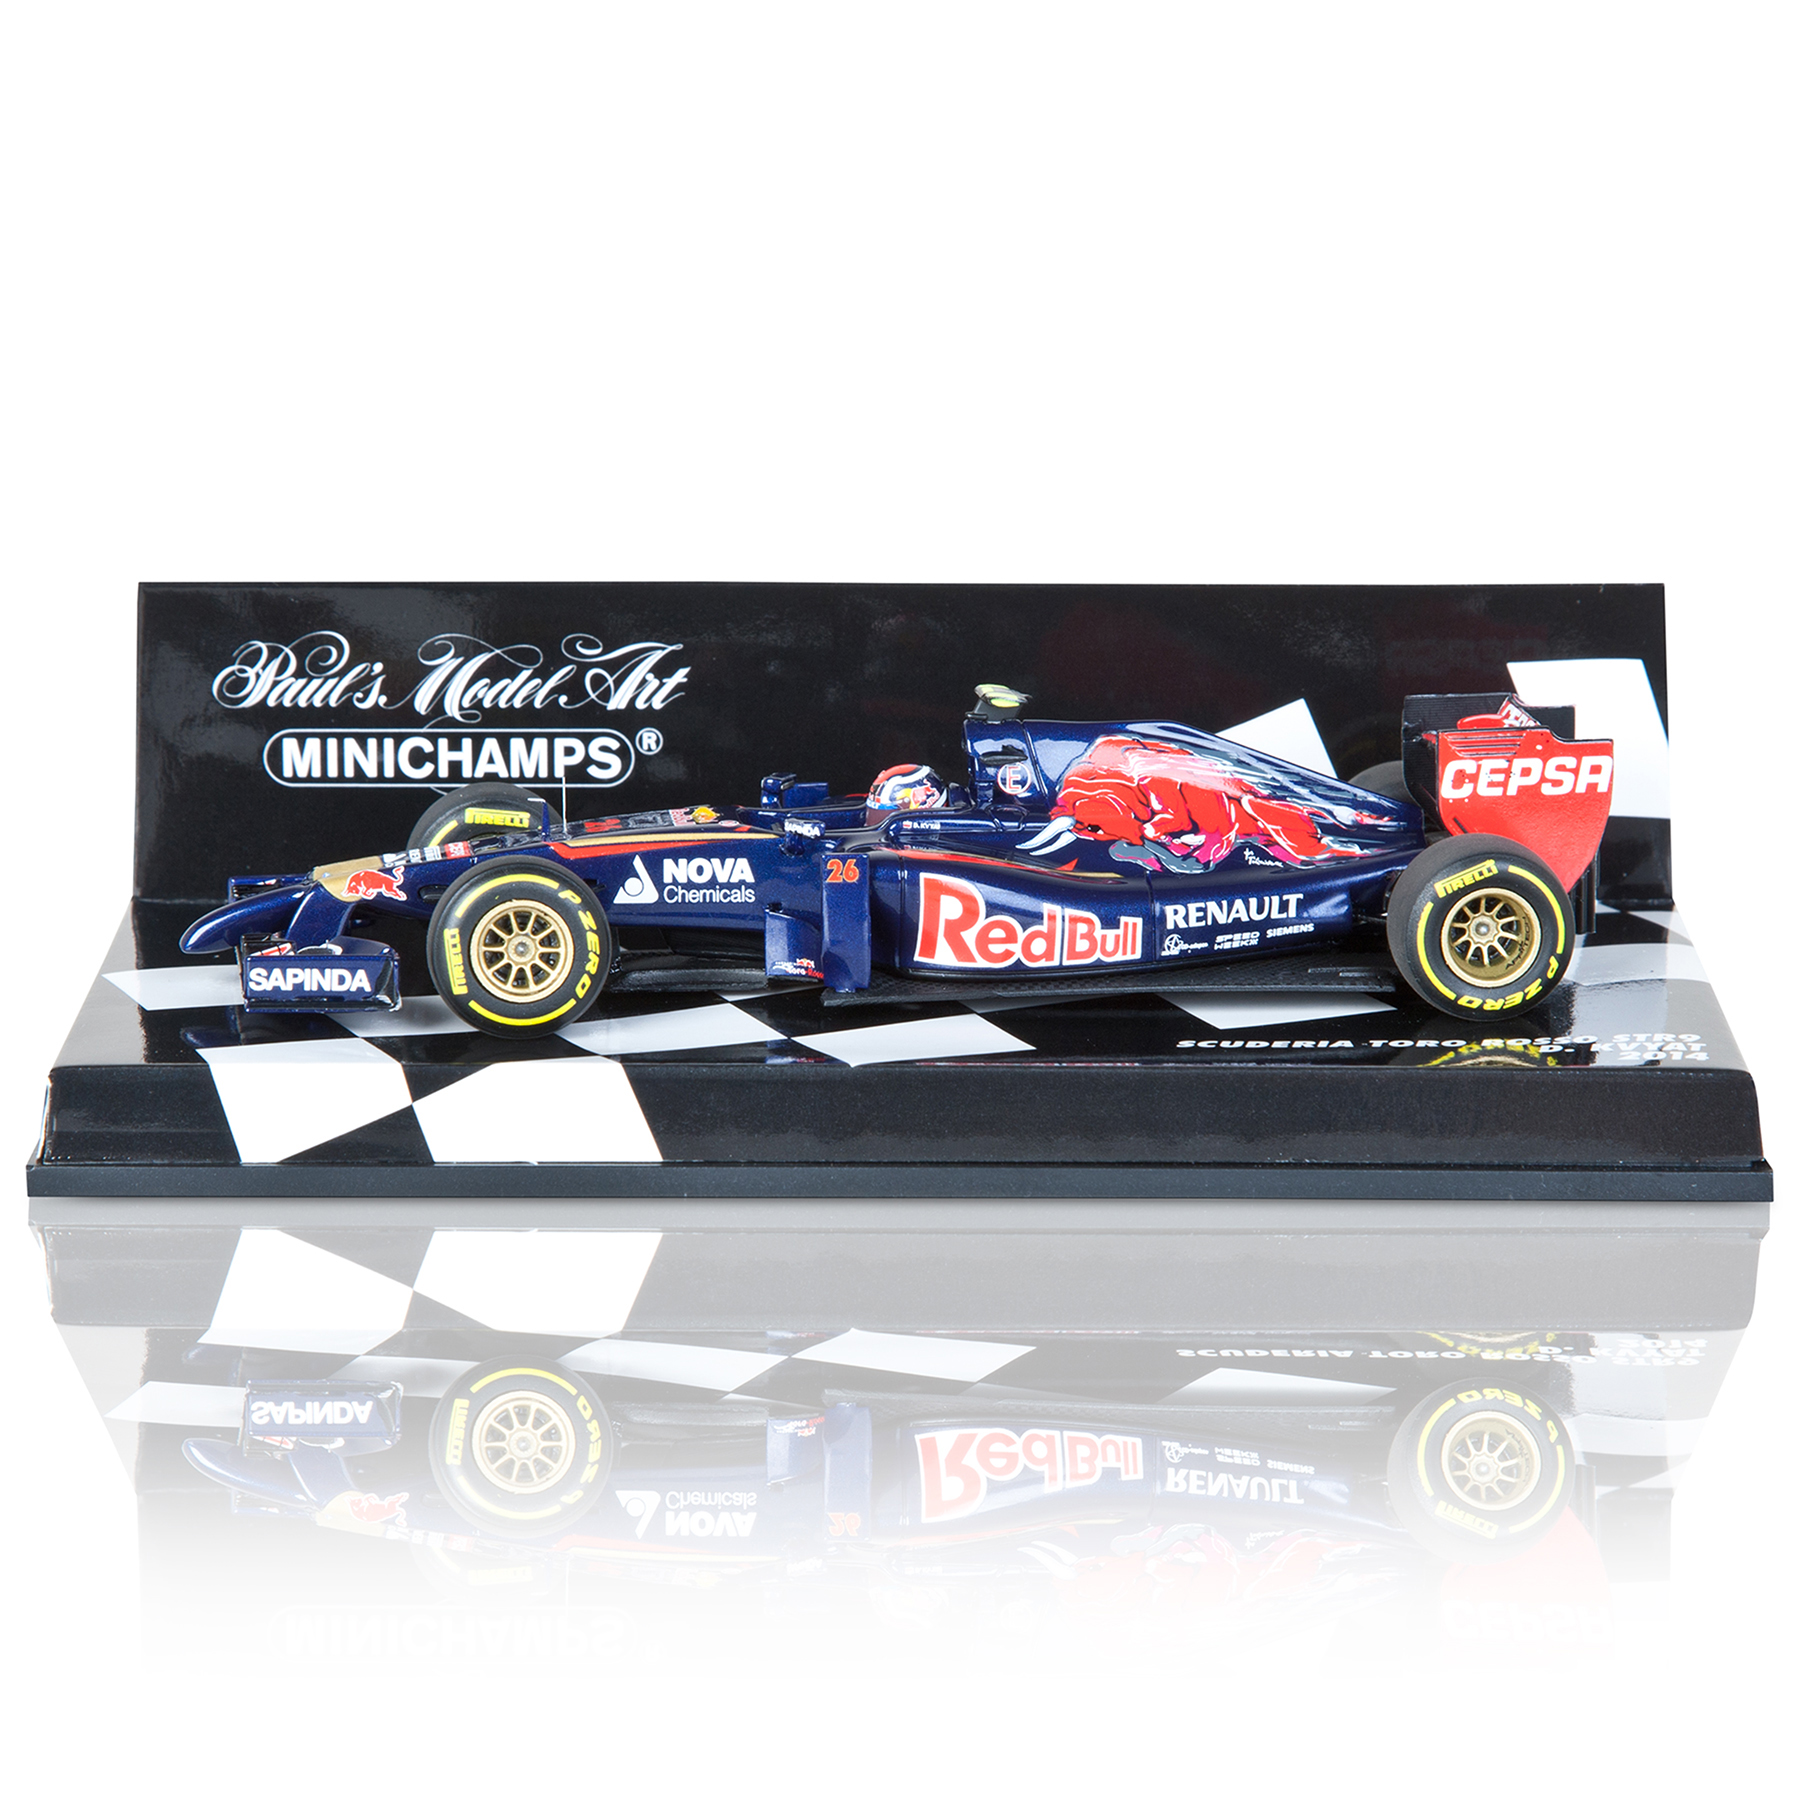 Scuderia Toro Rosso F1 STR9 Daniil Kvyat 2014 - 1:43 Scale